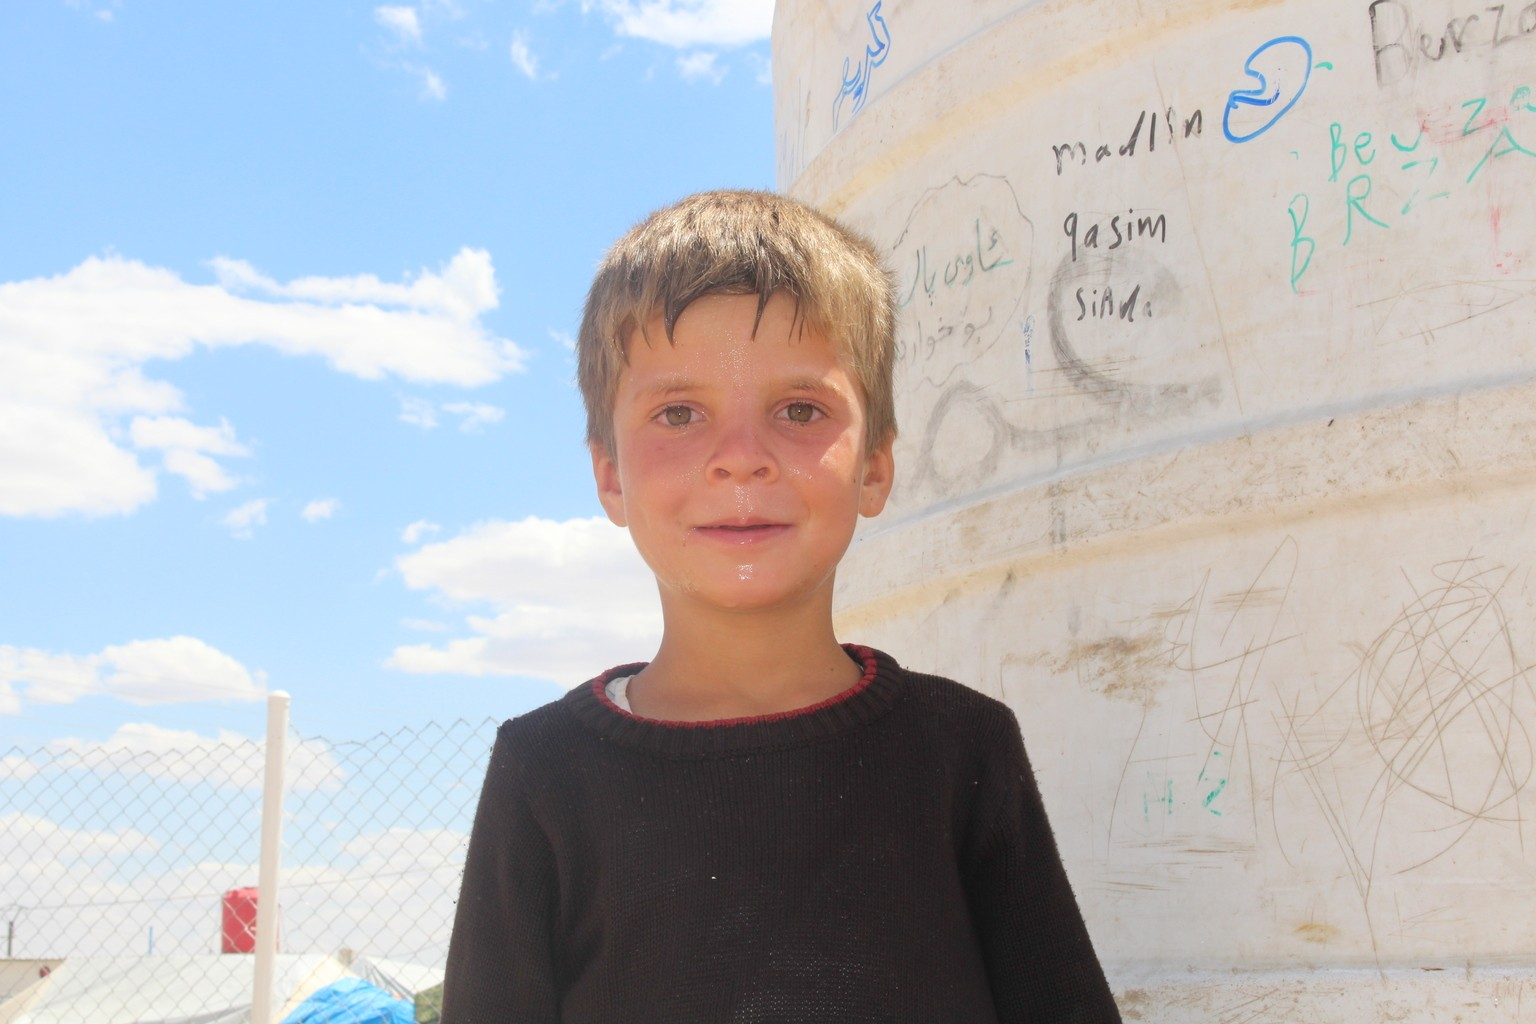 Fotoğraf © UNICEF/UN020940/Hasen